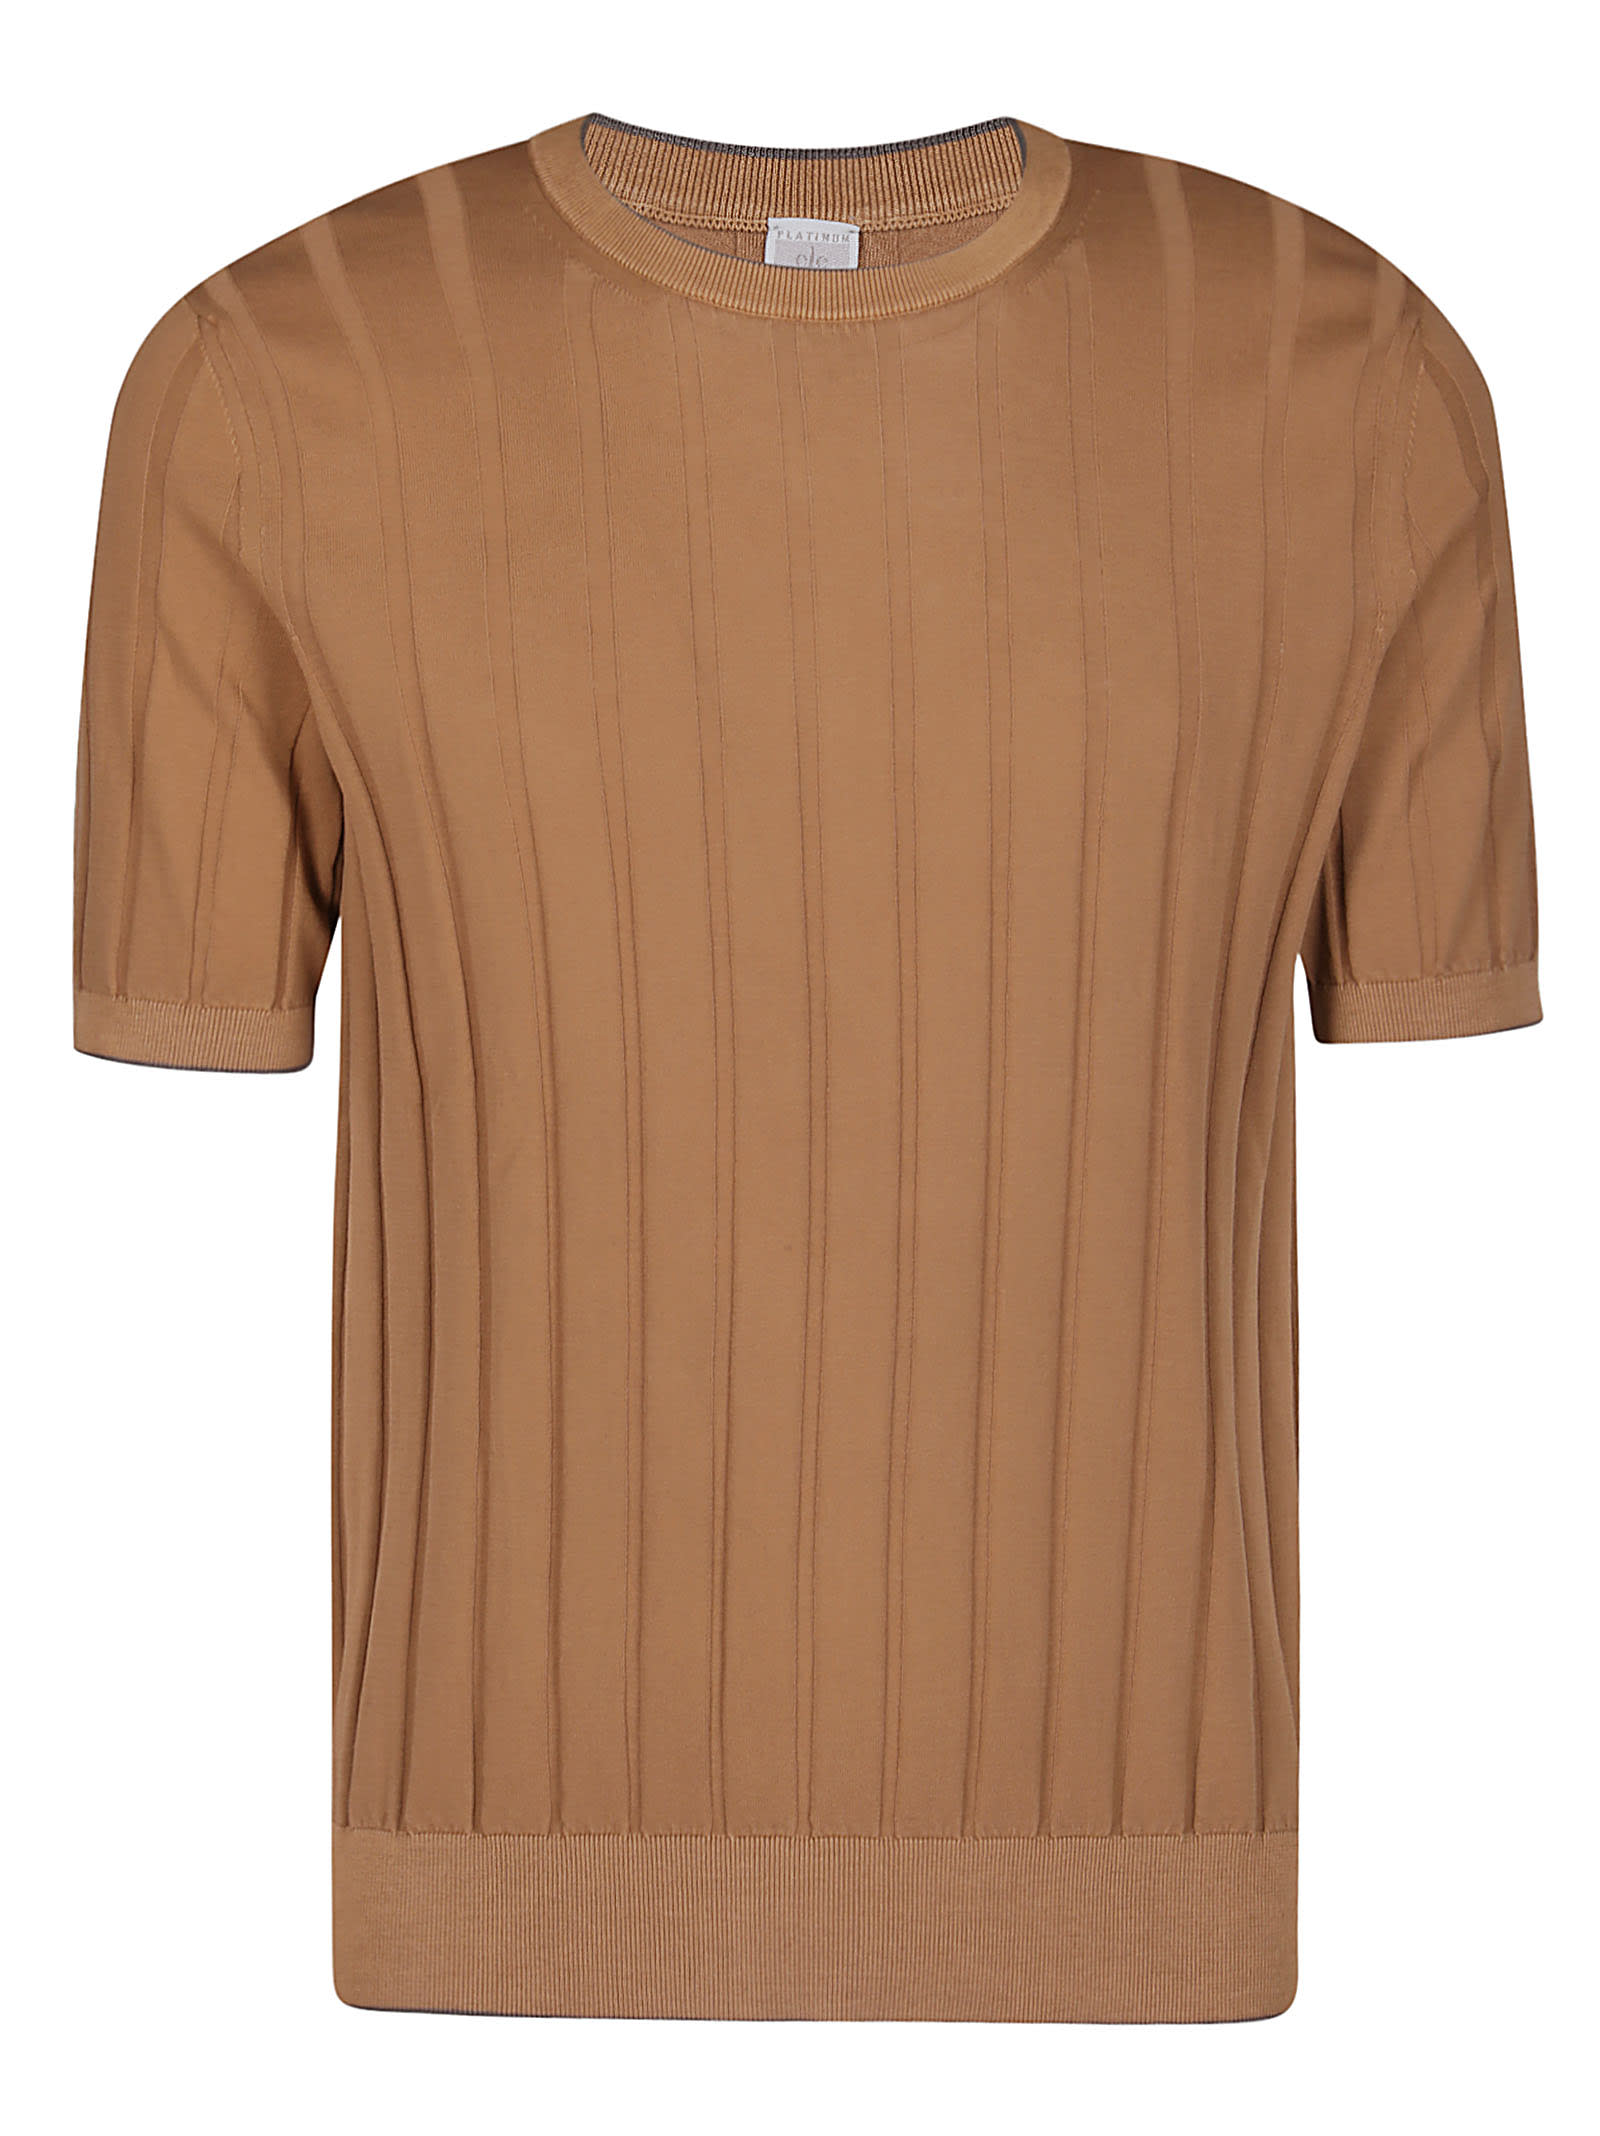 Eleventy Brown Cotton Top